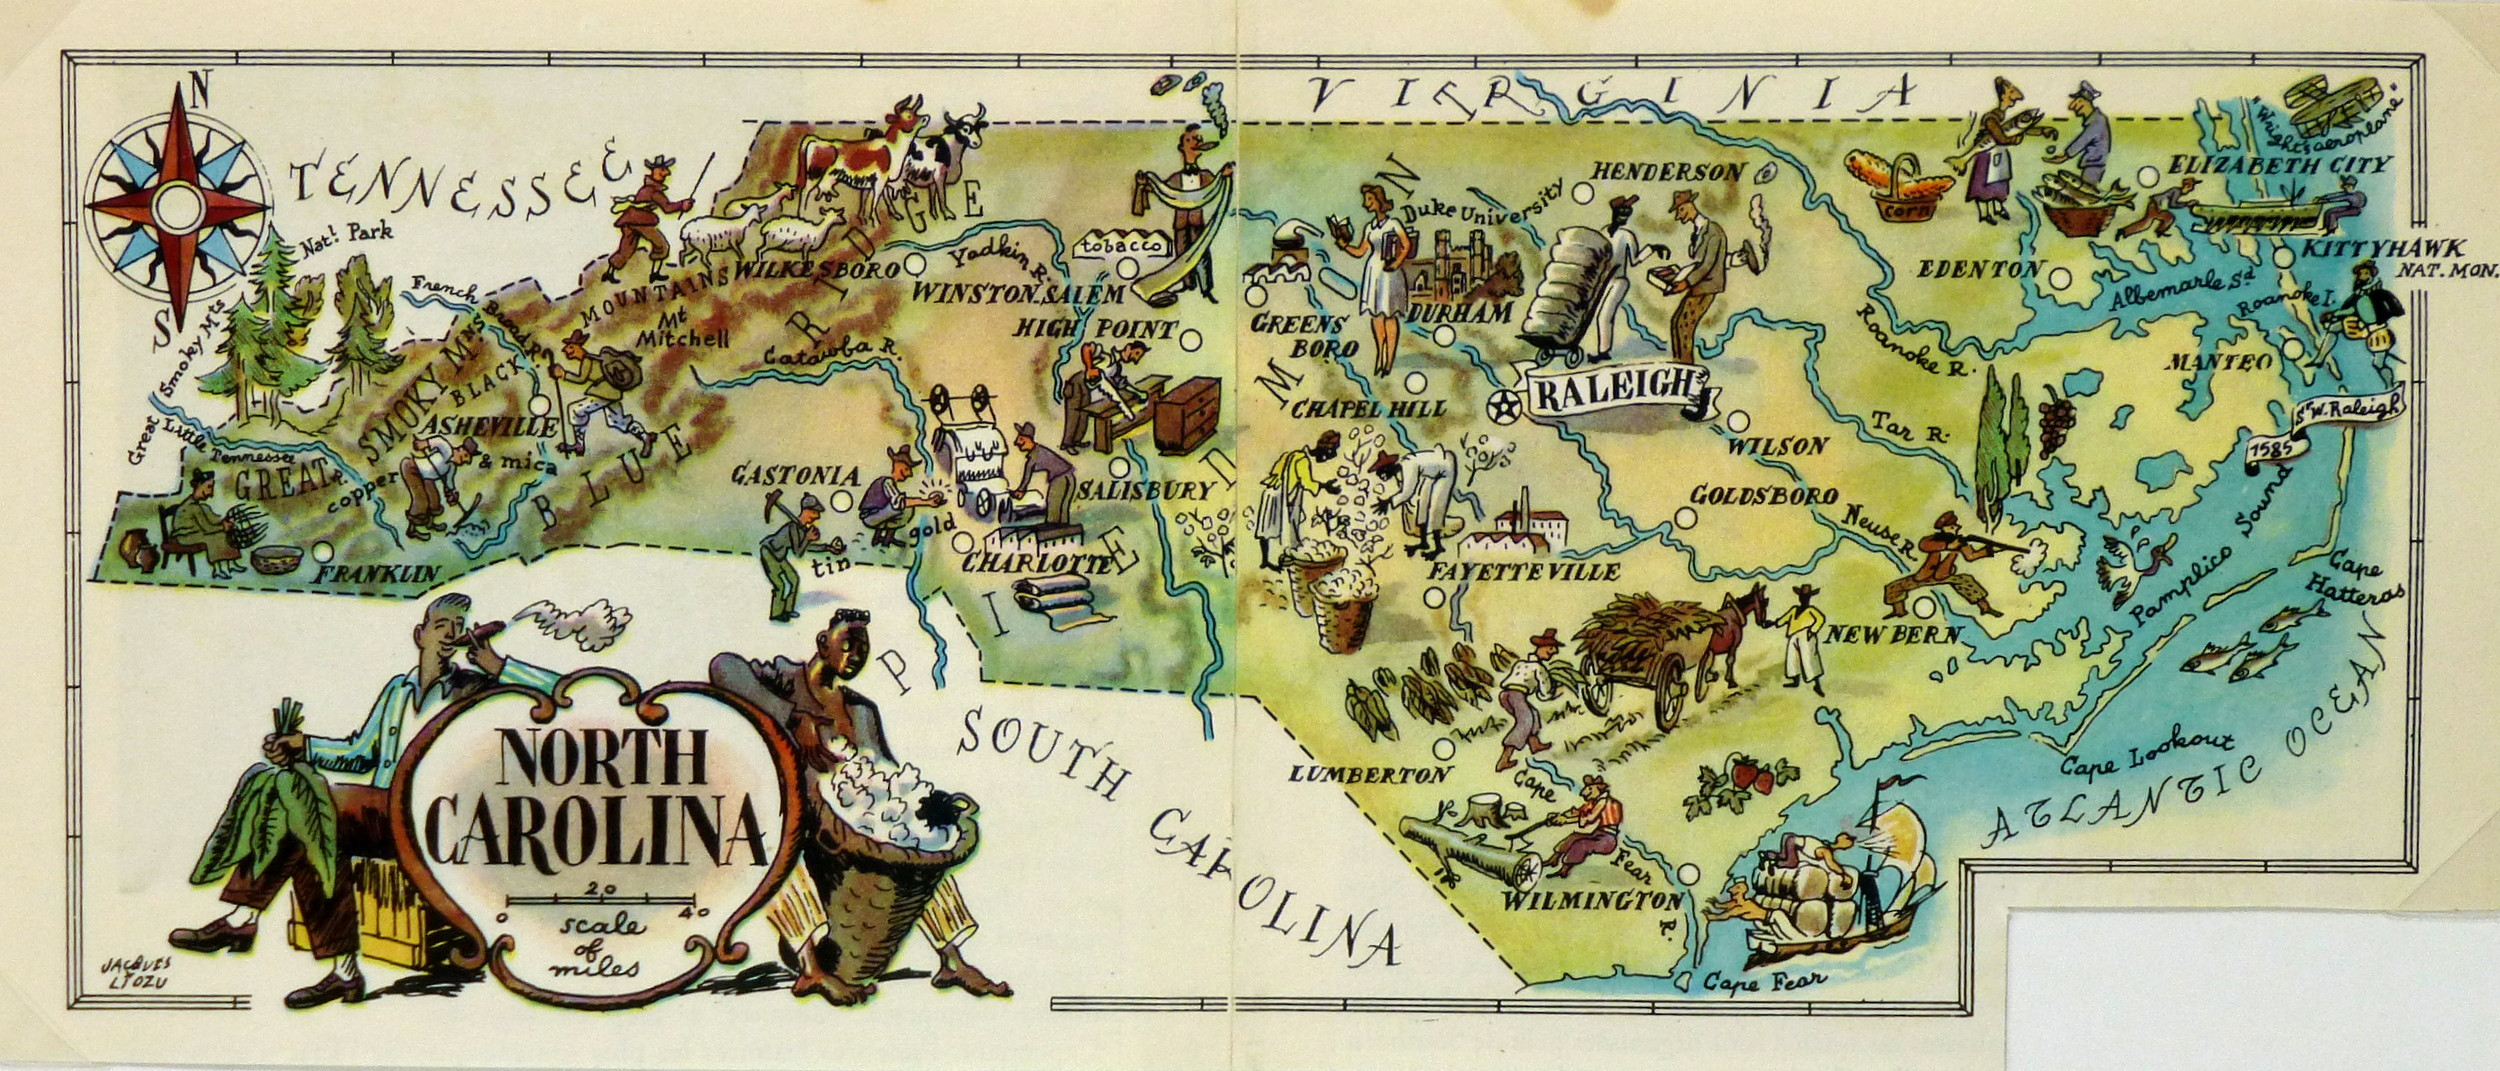 North Carolina Pictorial Map, 1946-main-6261K